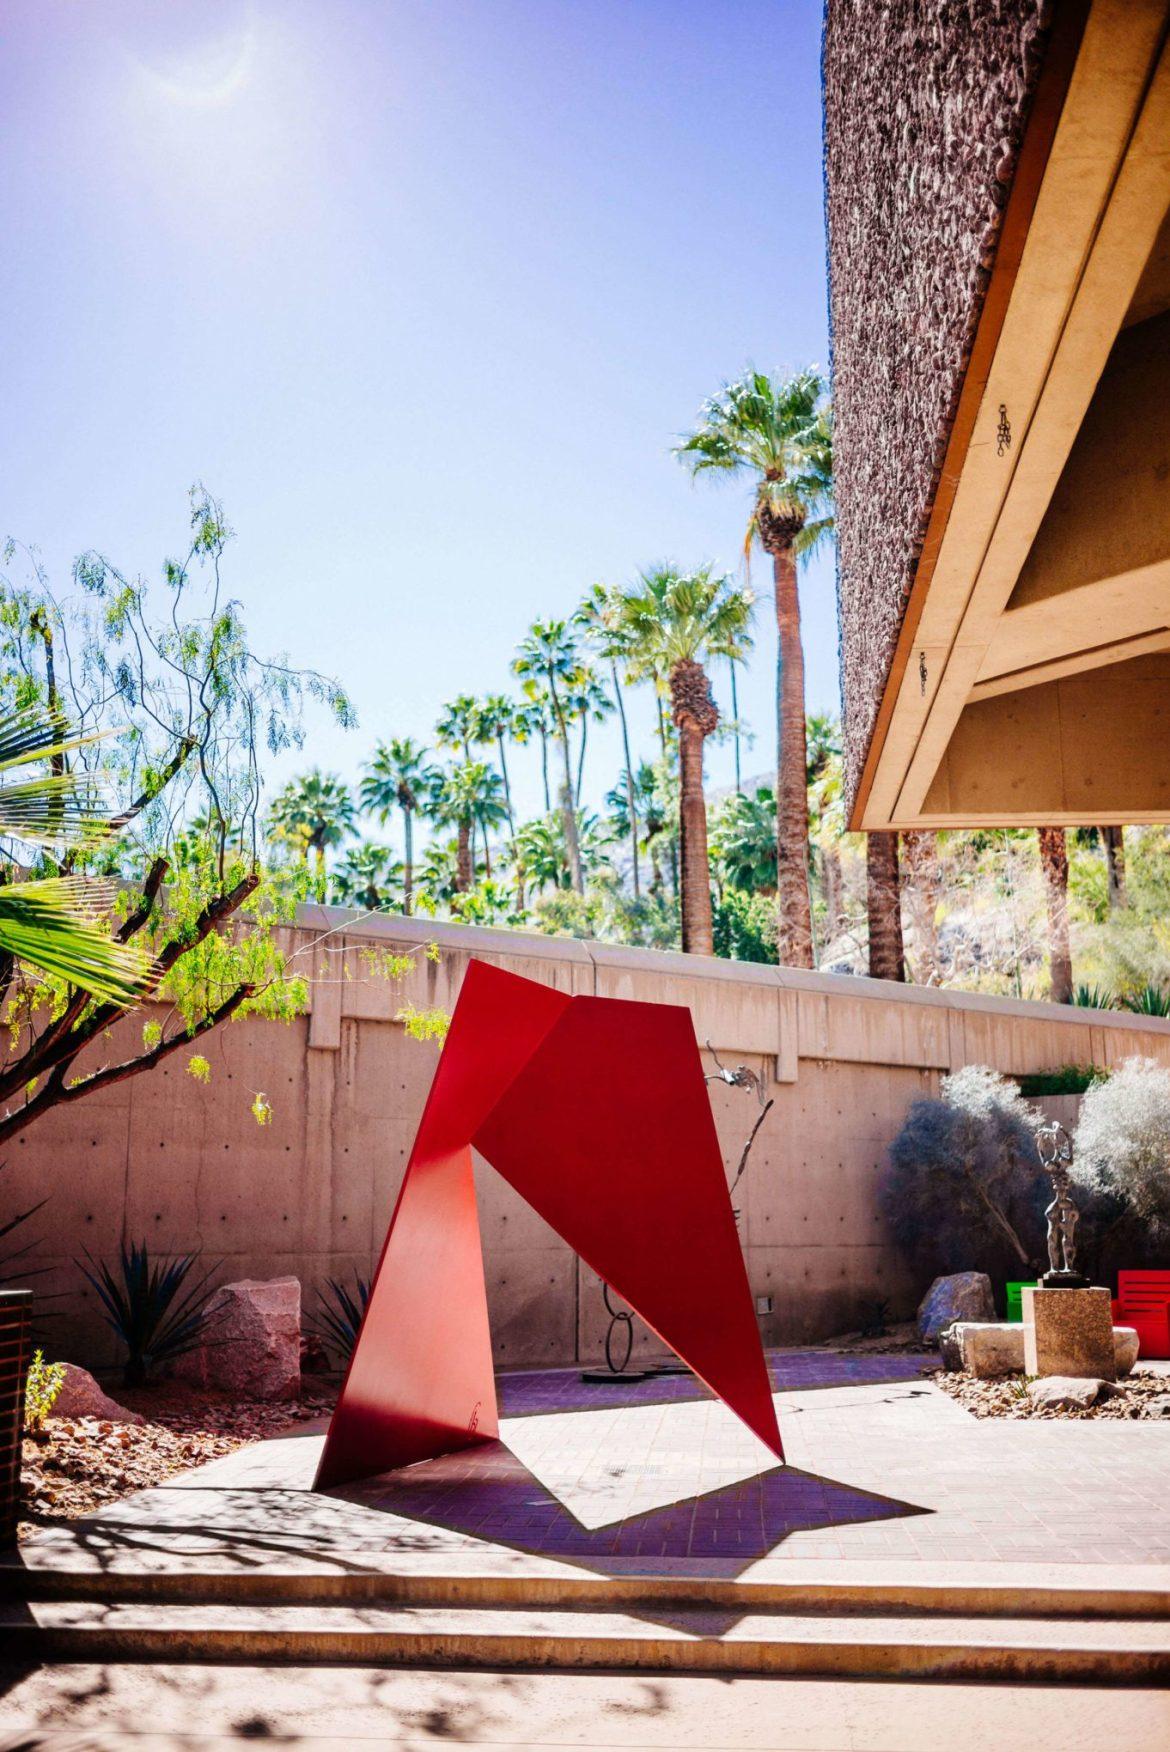 Sculpture garden at the Palm Springs Art Museum, The Taste Edit